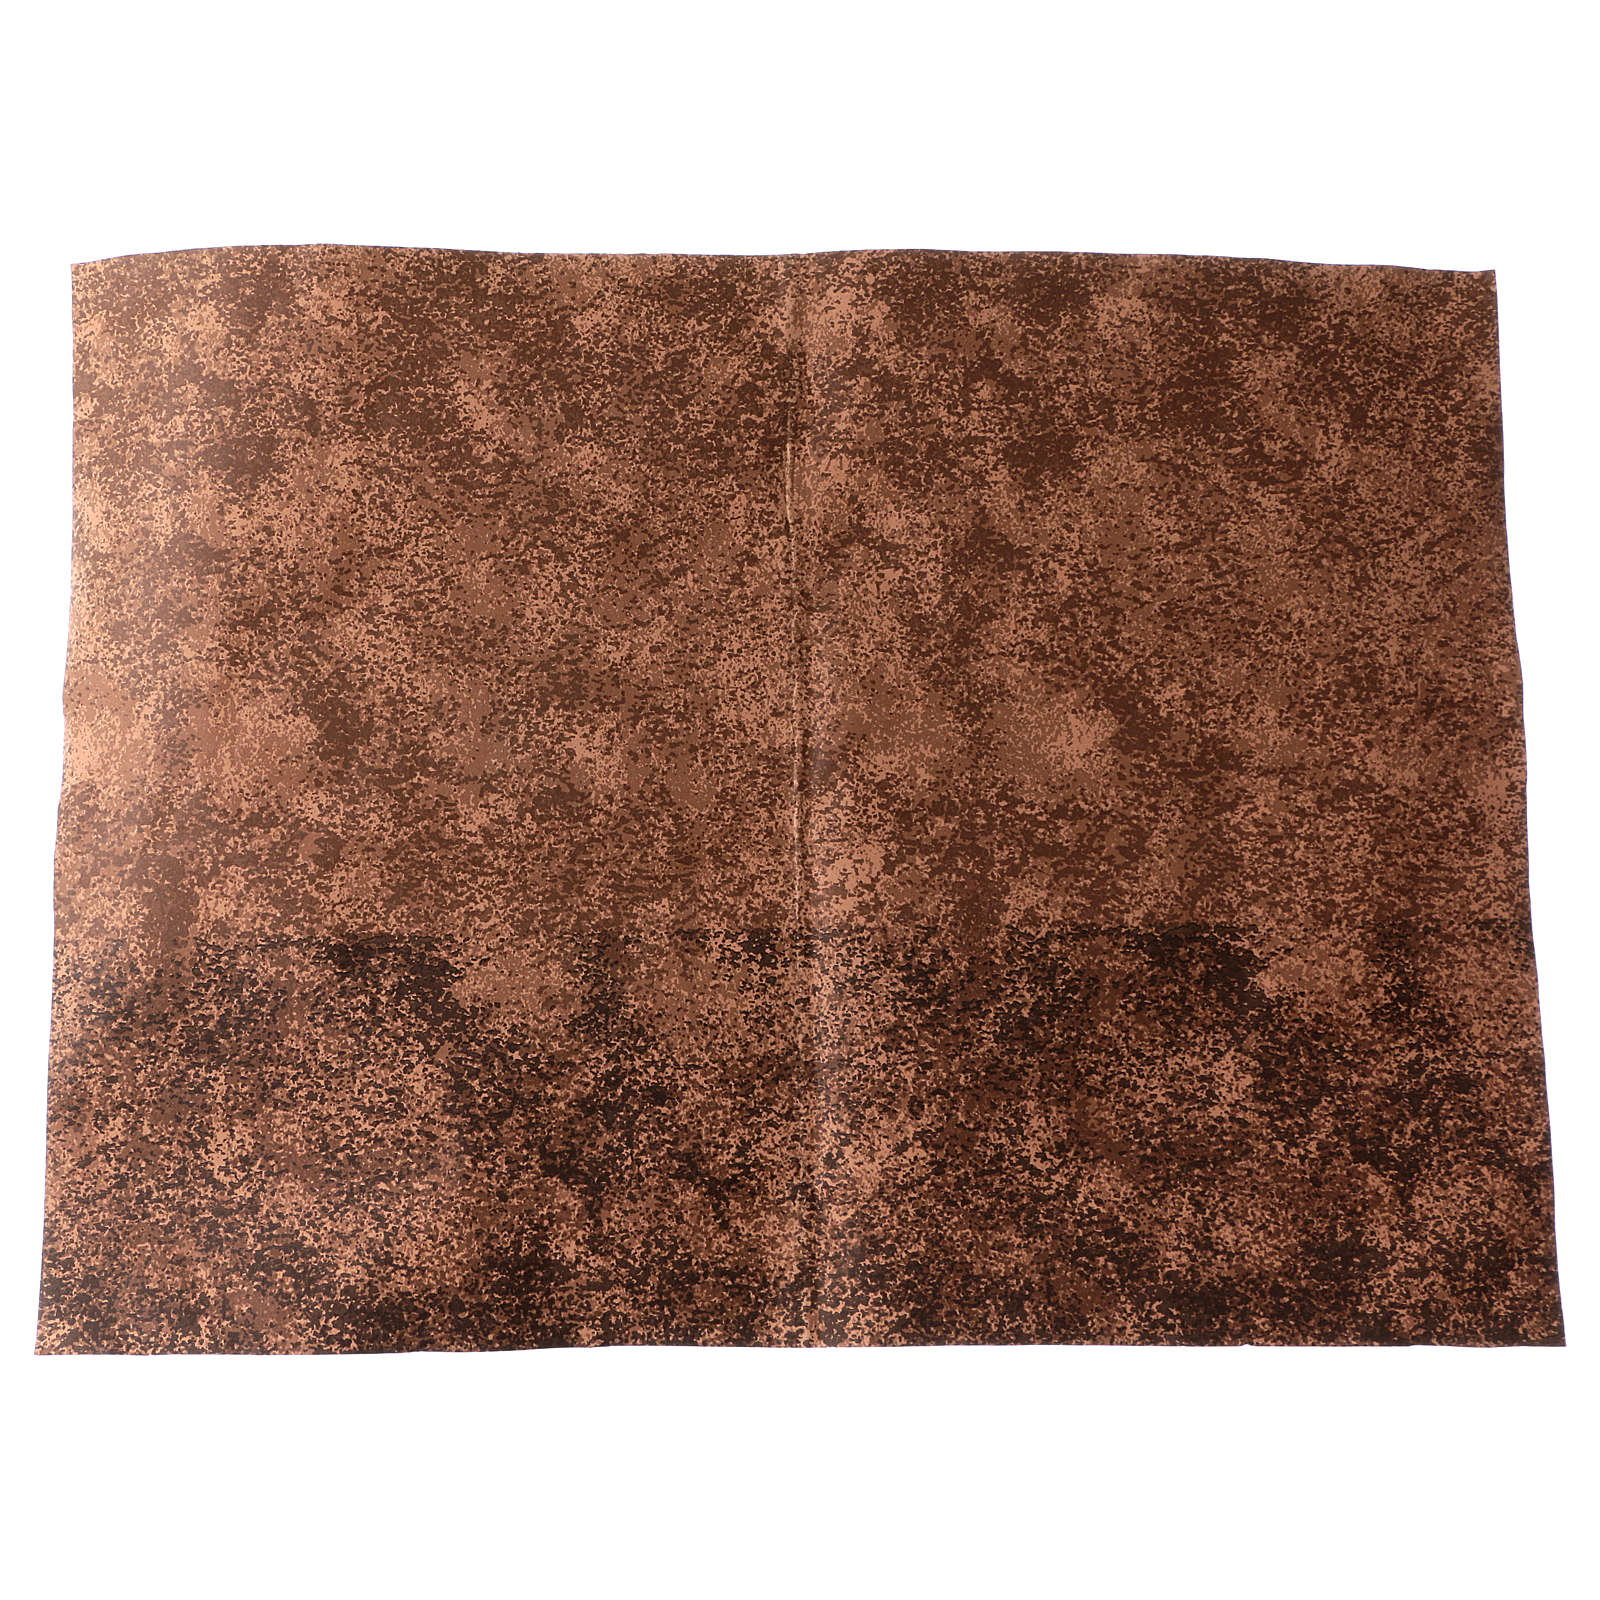 Carta modellabile terra 50x70 cm 4